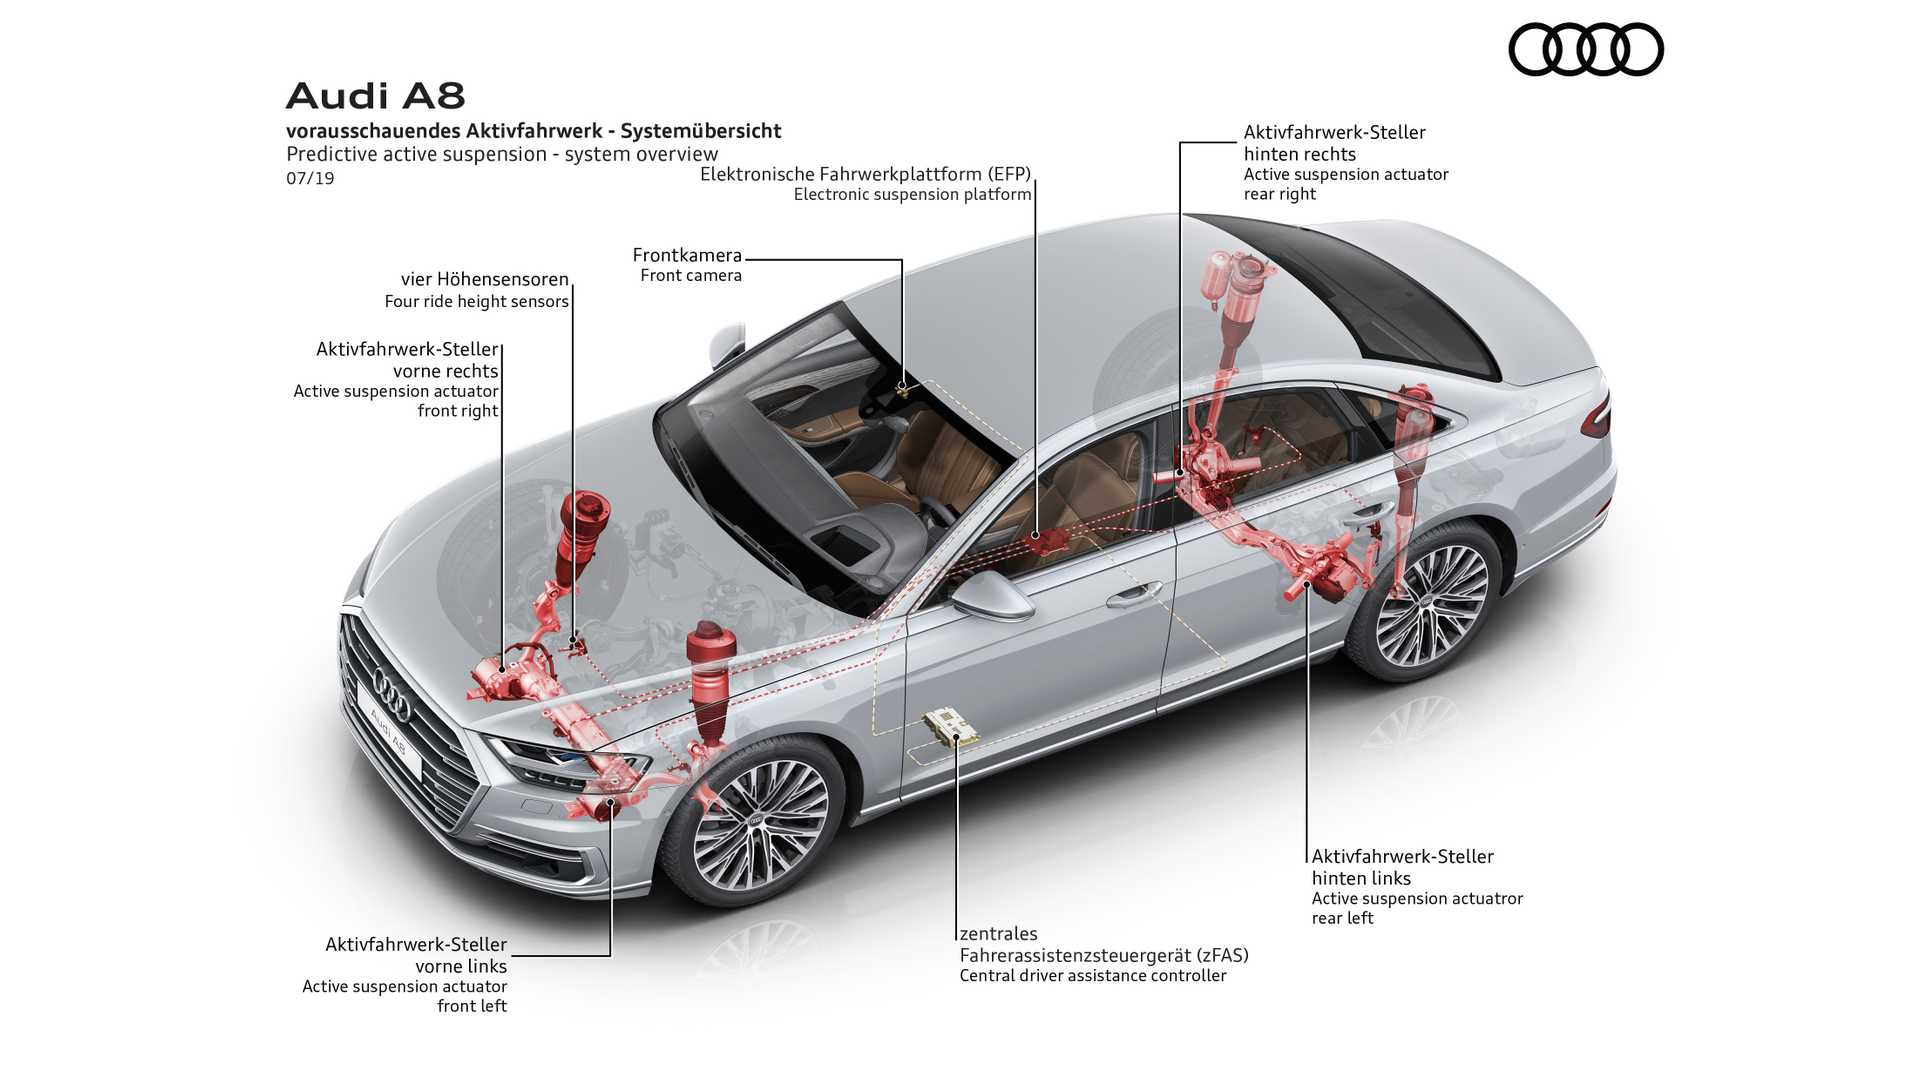 Audi-A8-with-predictive-active-suspension-4